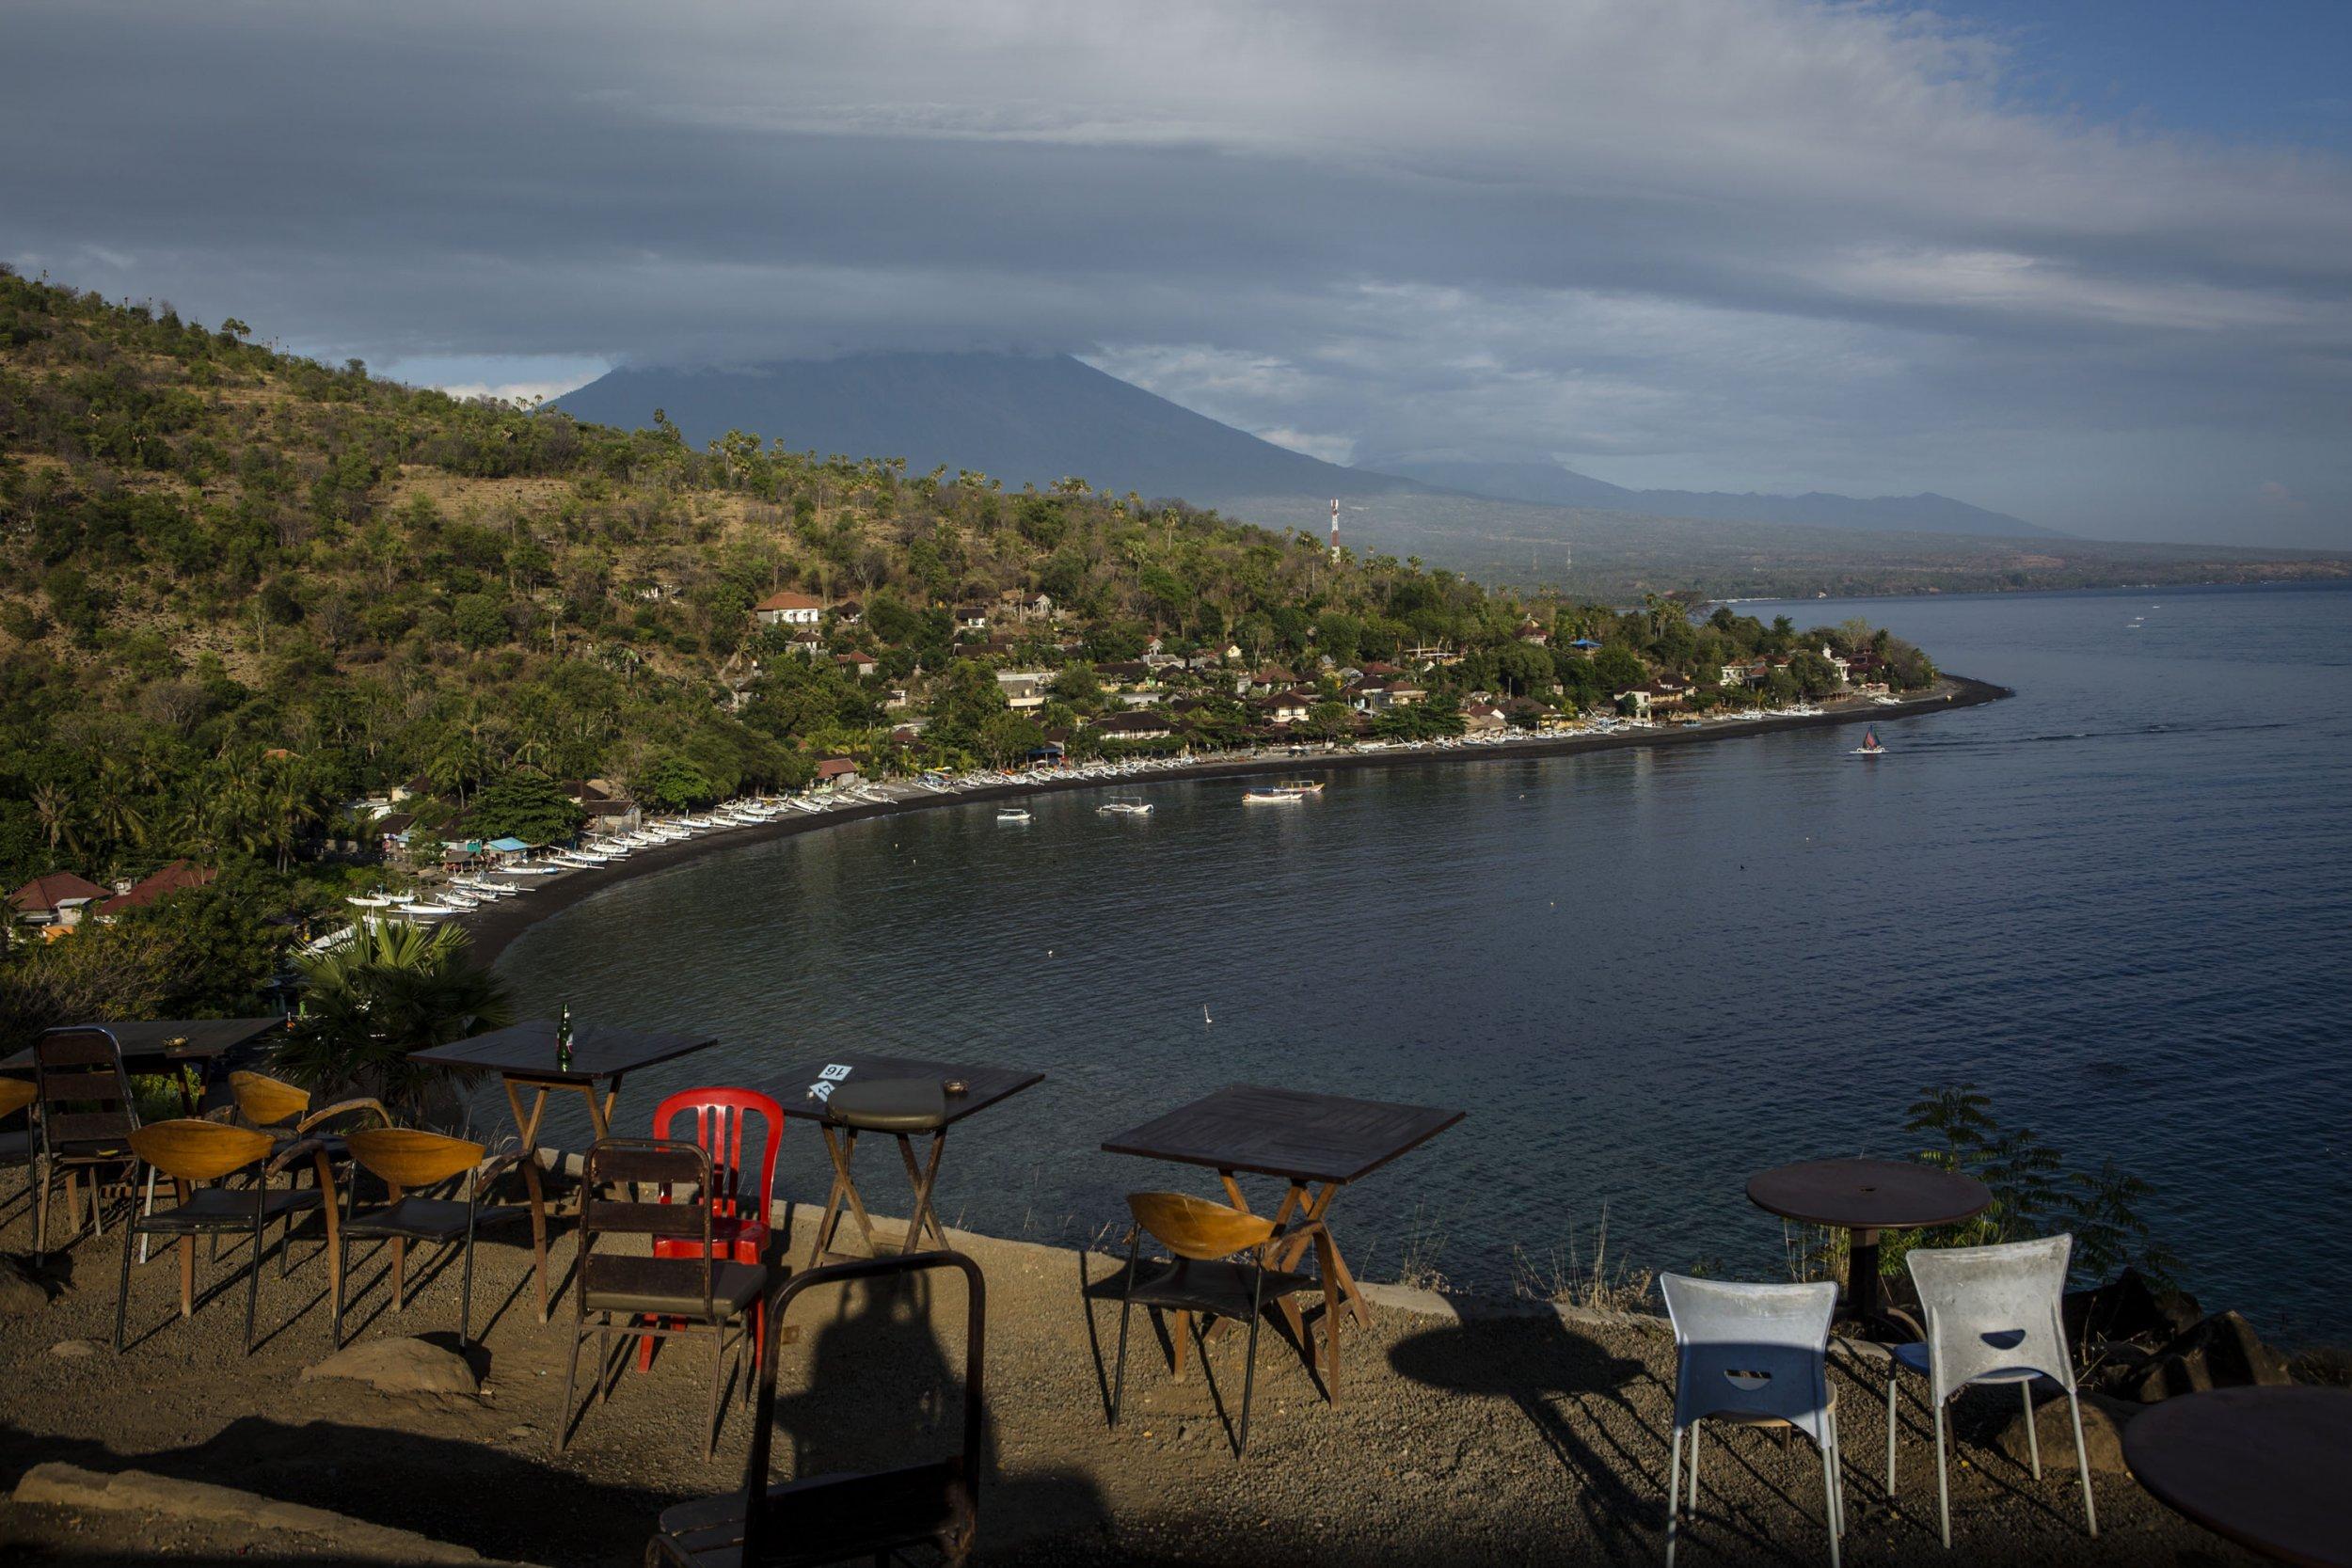 09_25_Bali_Volcano